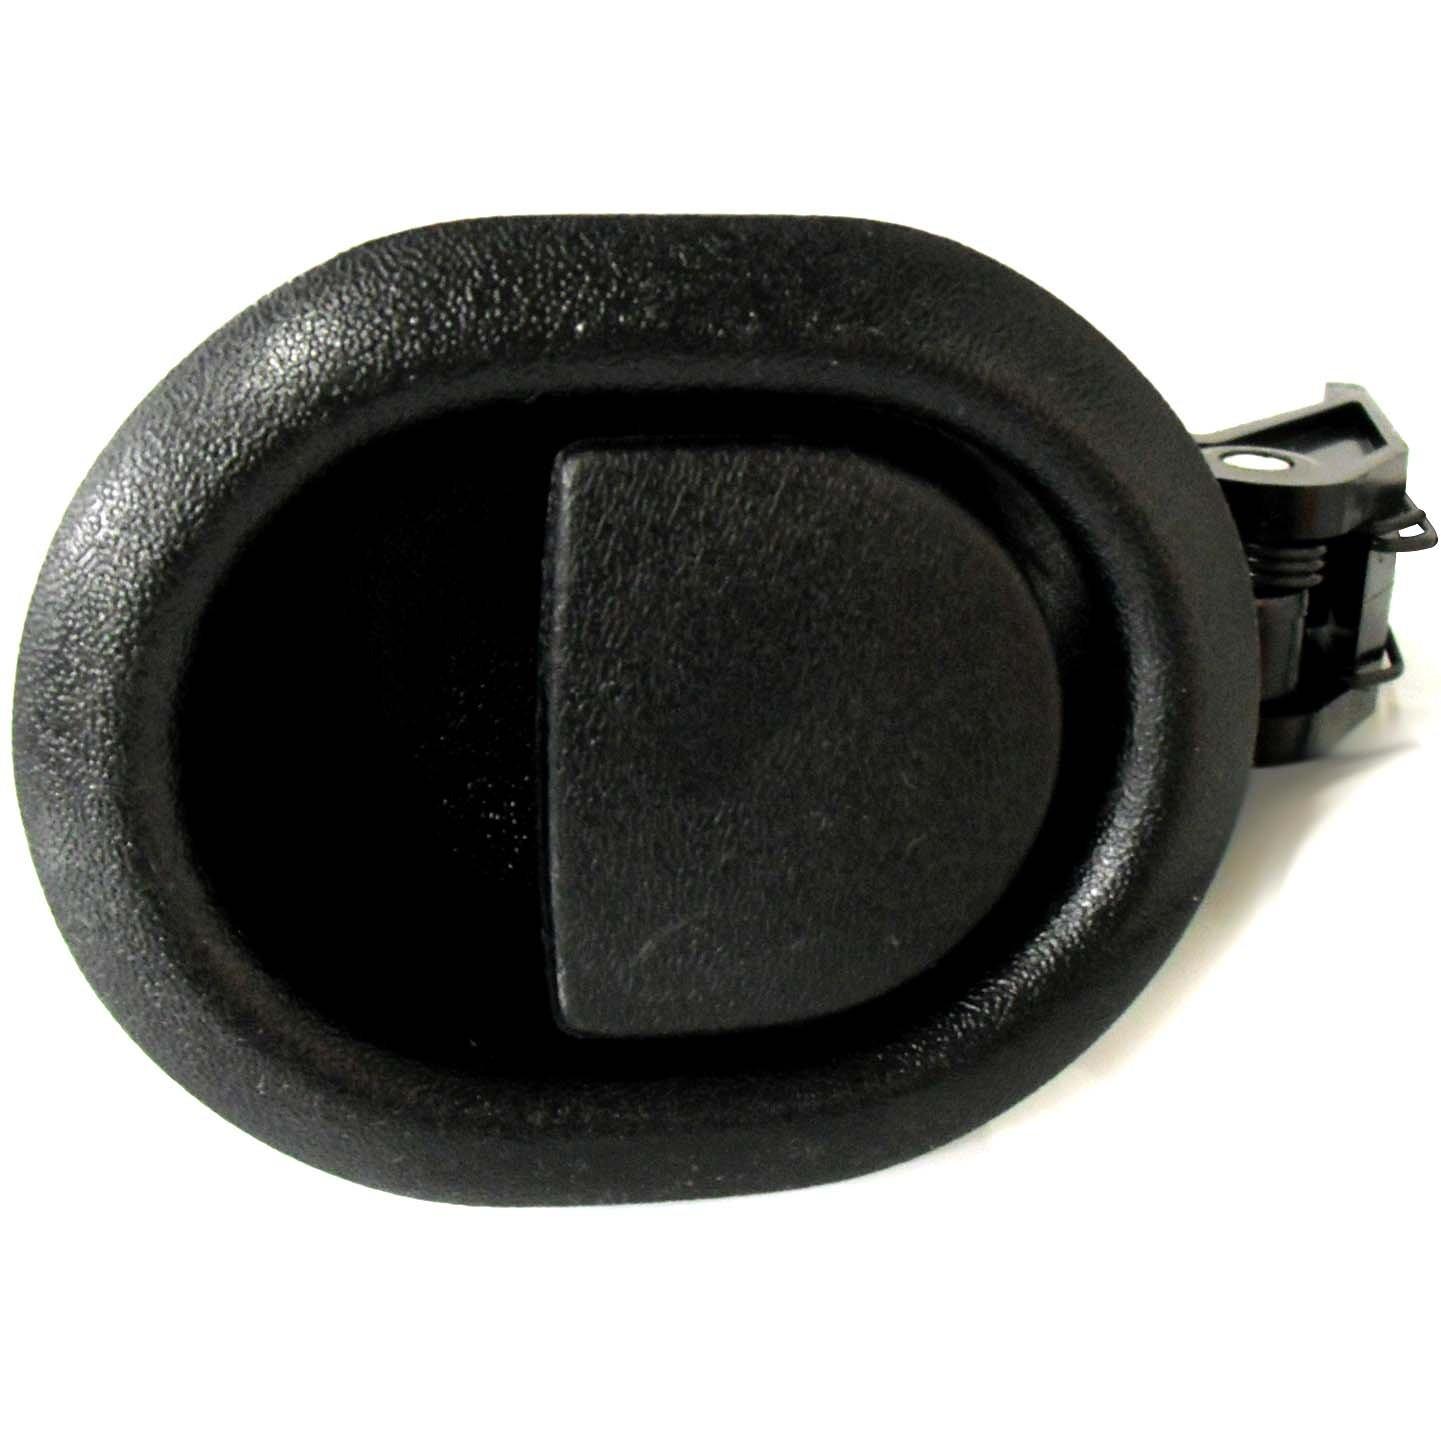 Choice Parts - Black Recliner Release Handle - Comes Cable Clip